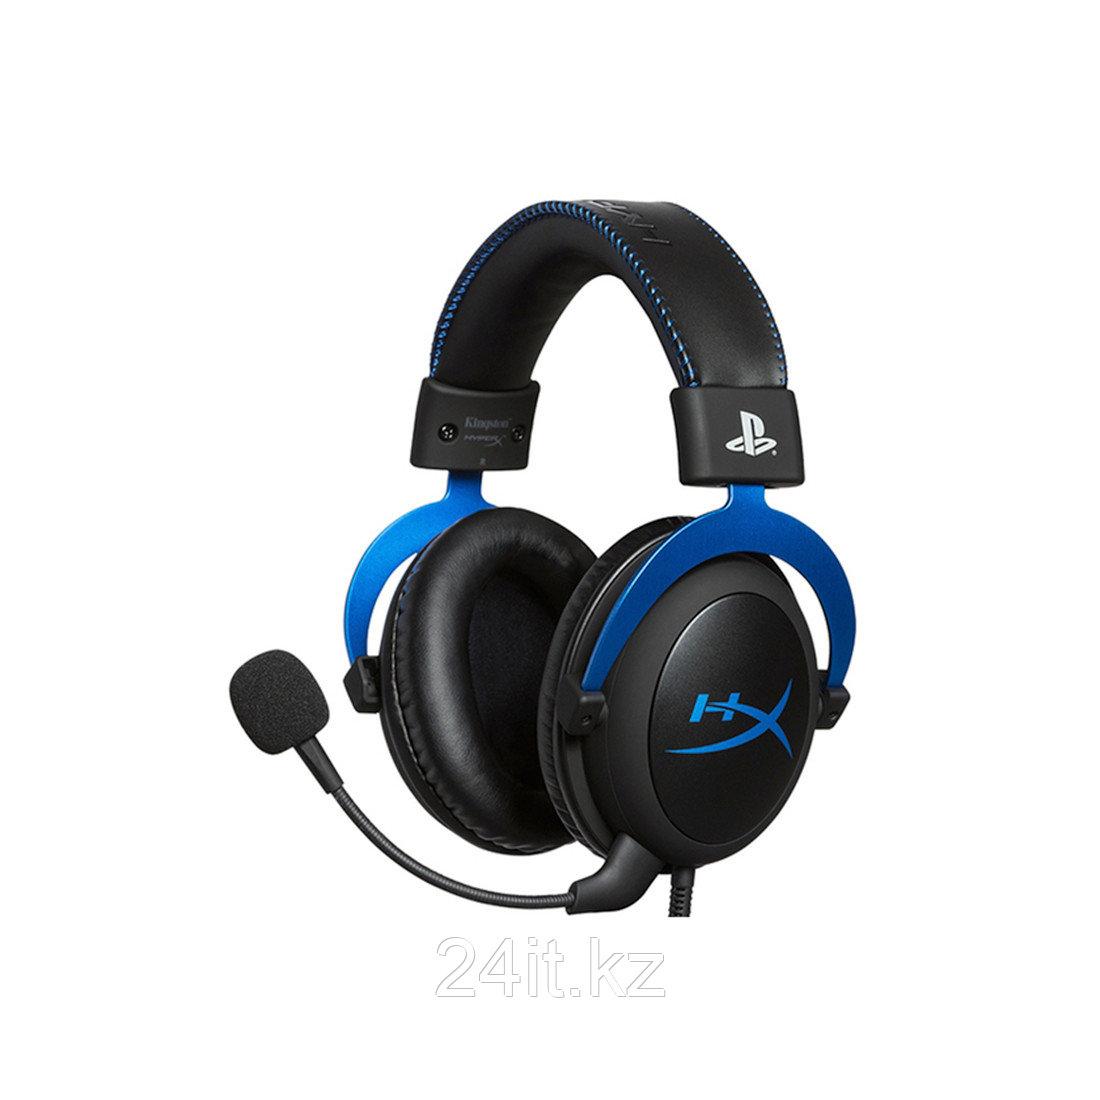 Гарнитура HyperX Cloud Gaming Headset - Blue for PS4 HX-HSCLS-BL/EM - фото 2